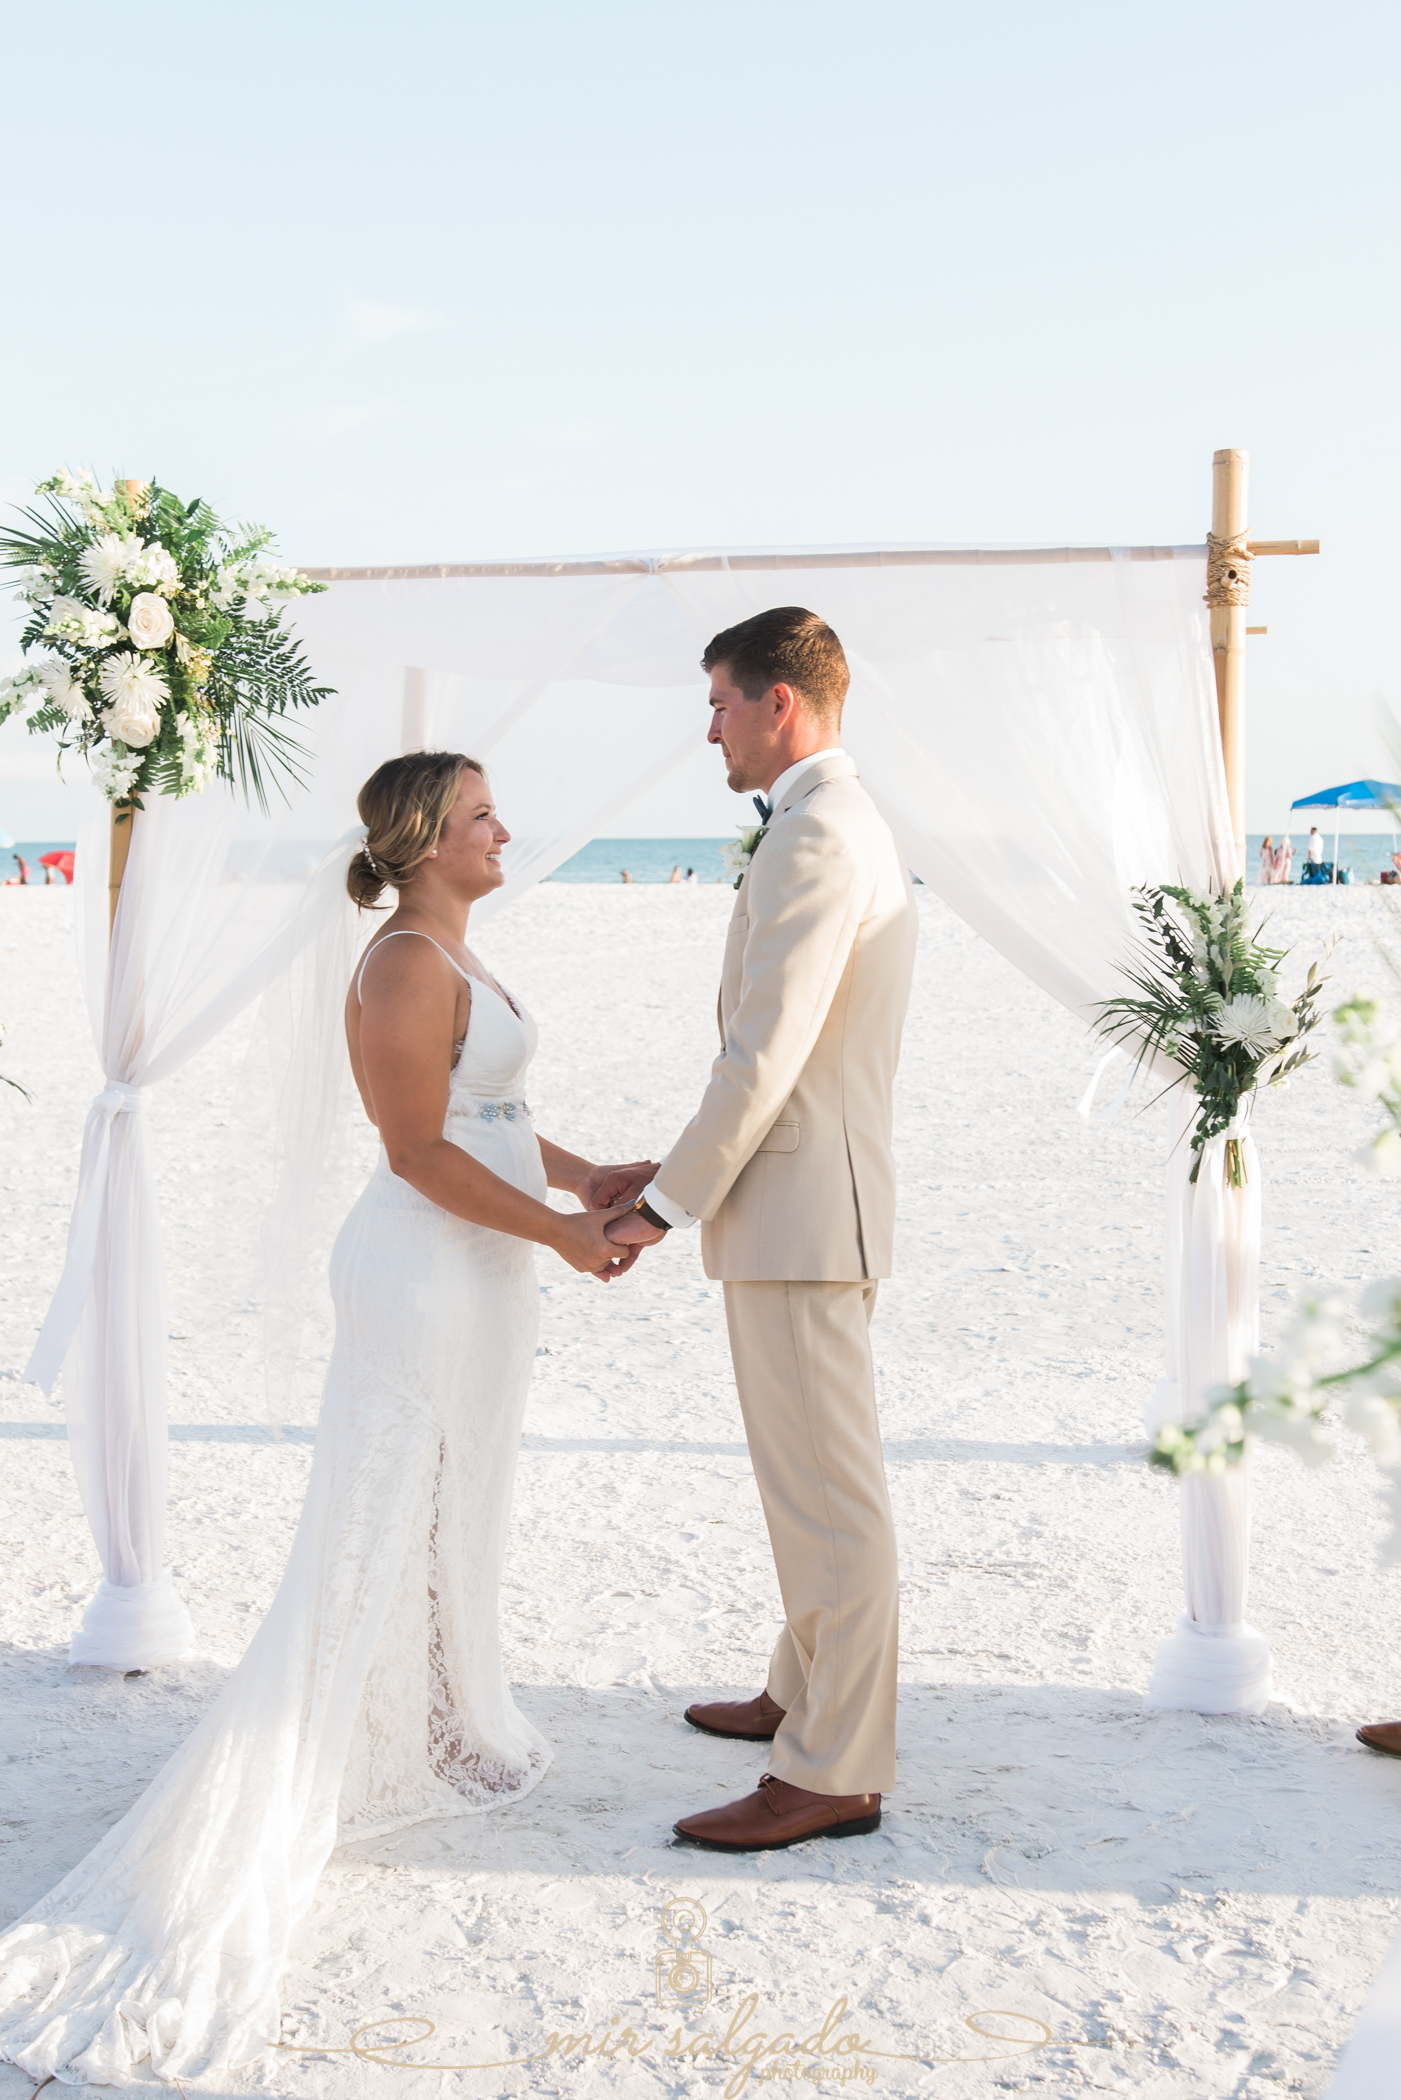 Florida-beach-wedding, Sarasota-wedding-photo